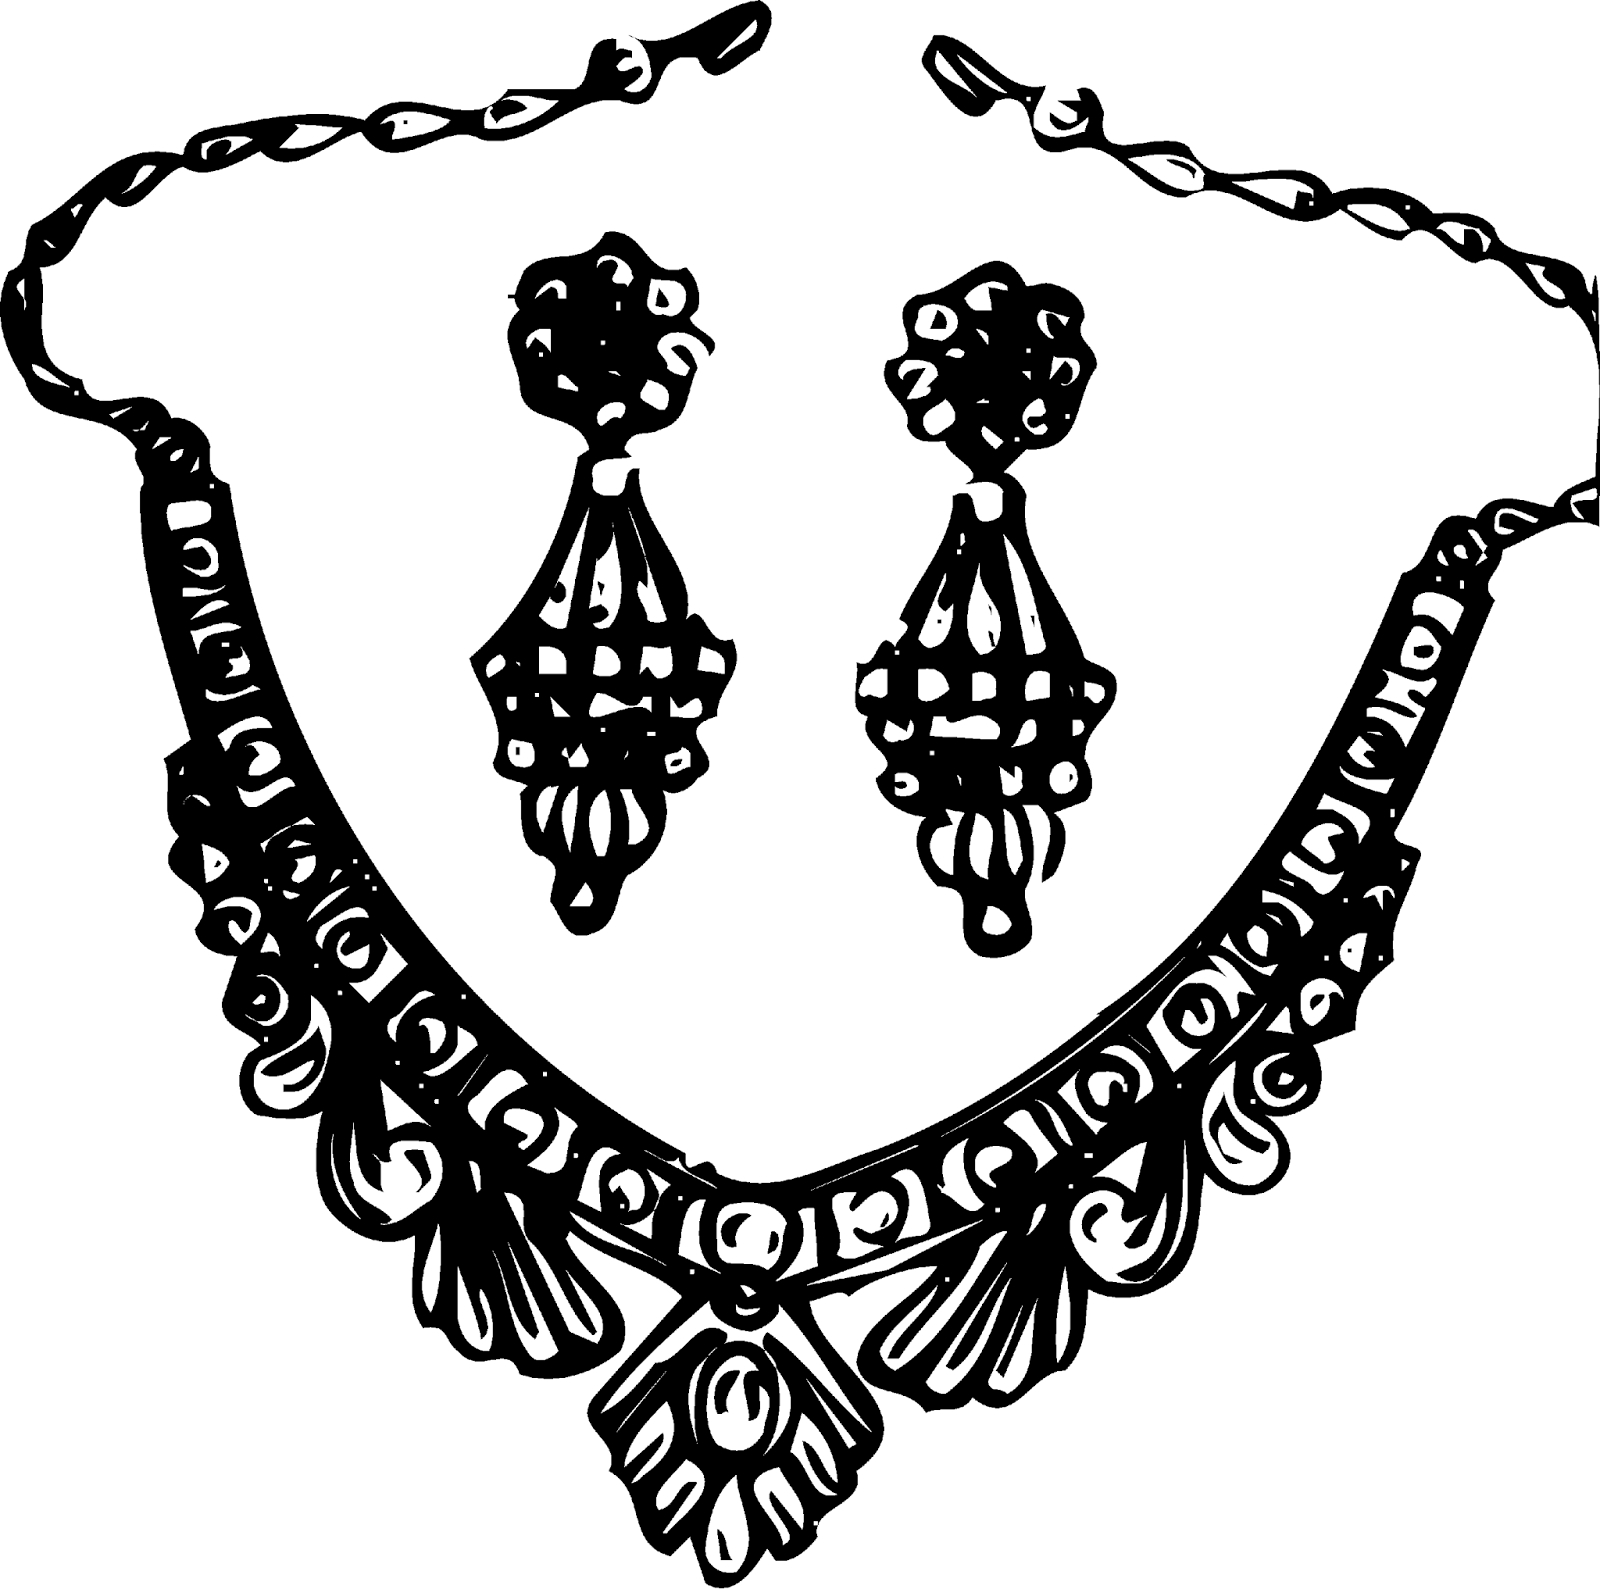 Jewelry clipart. Best of gallery digital